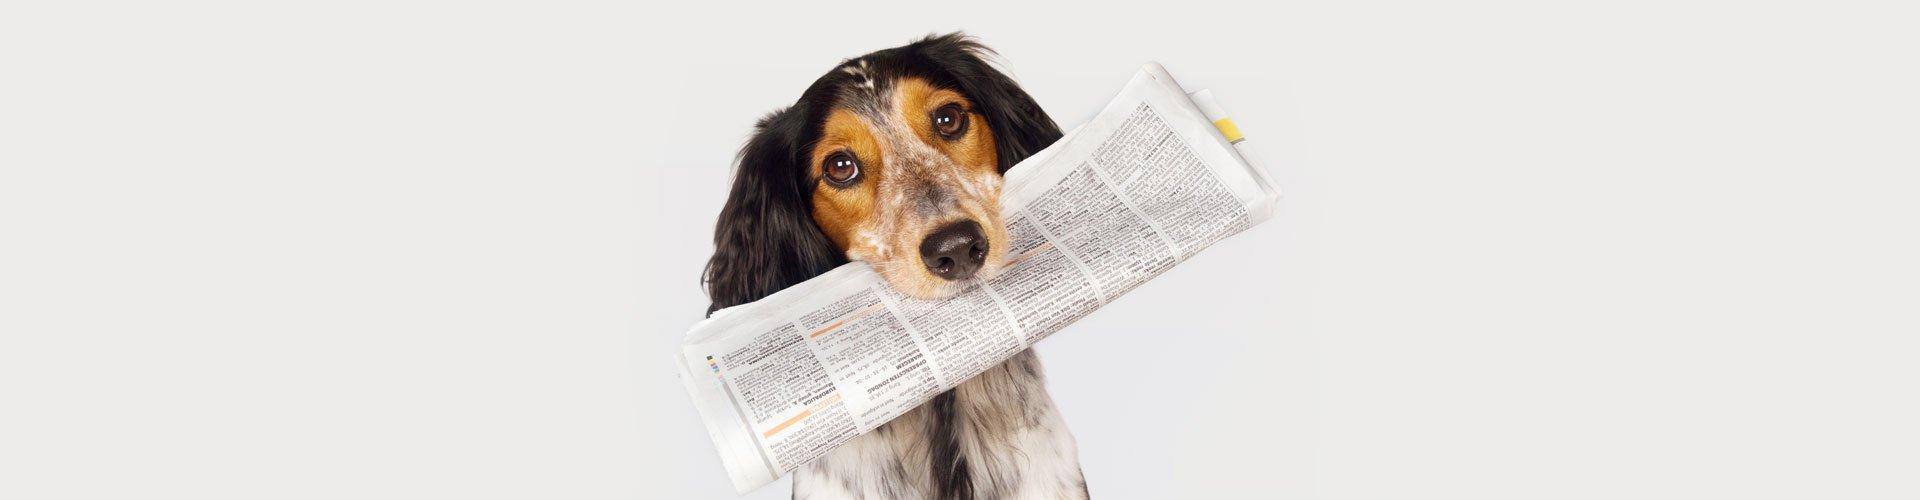 O Δρ. Καραγιάννης στη Διημερίδα για την Προστασία των Ζώων Συντροφιάς